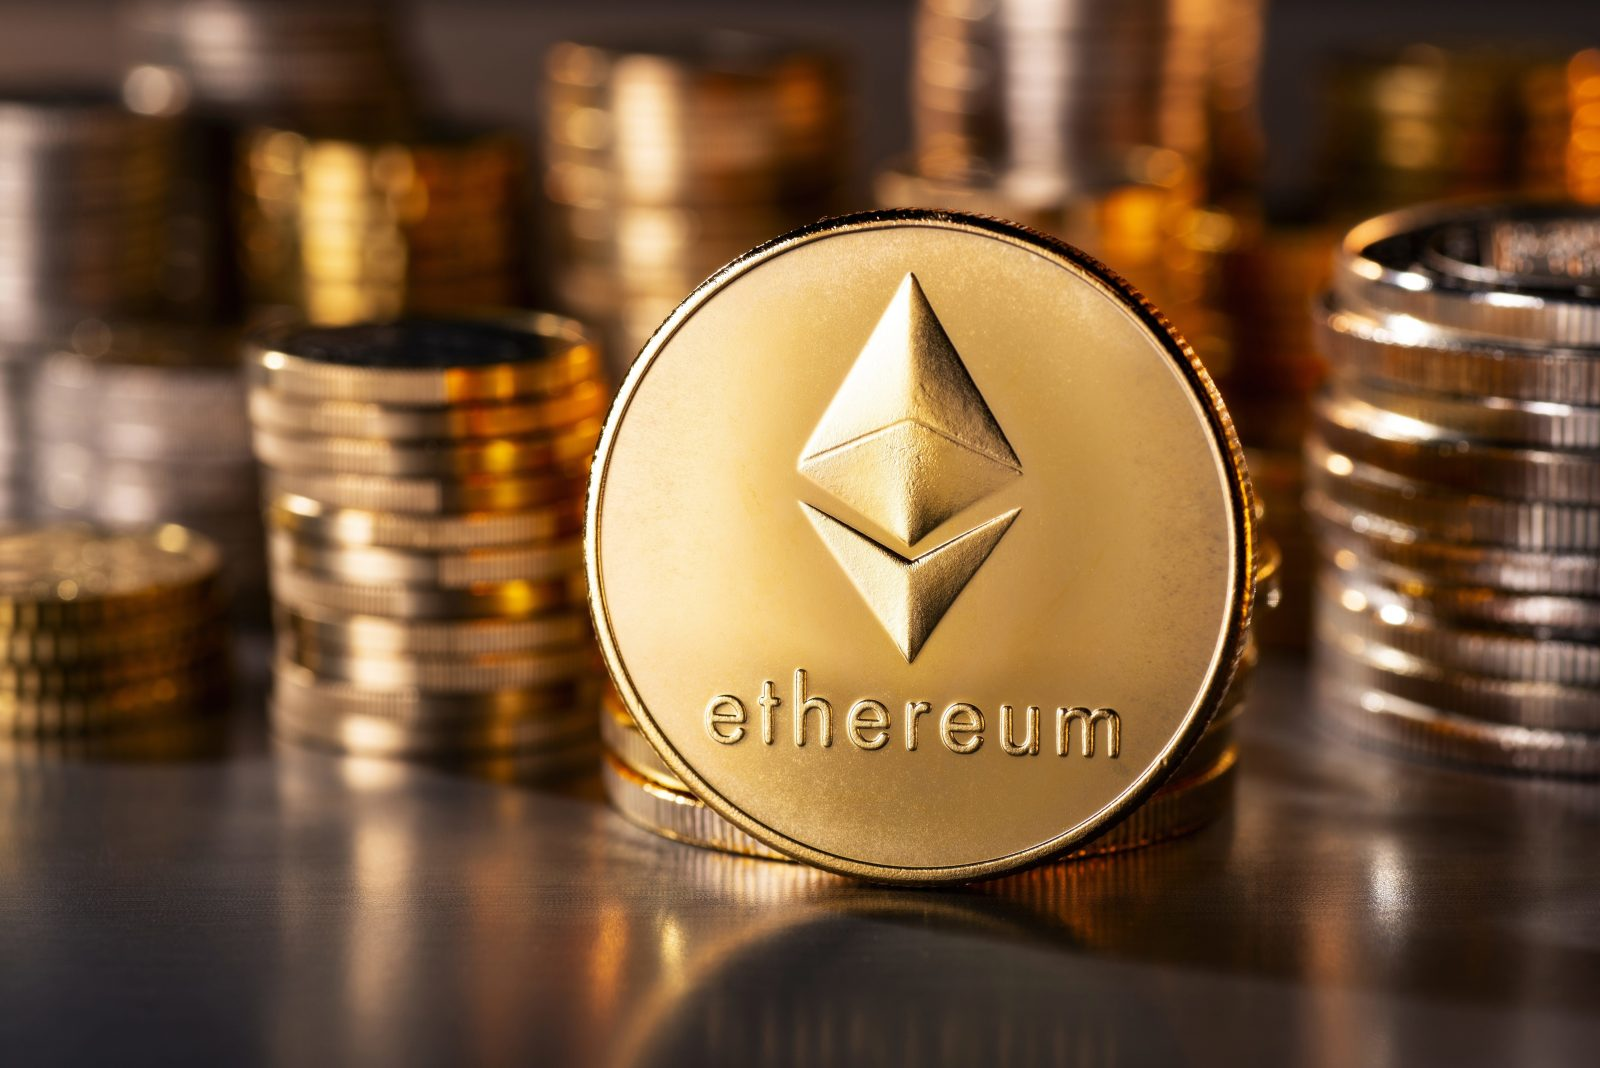 commerciale tra bitcoin e ethereum)